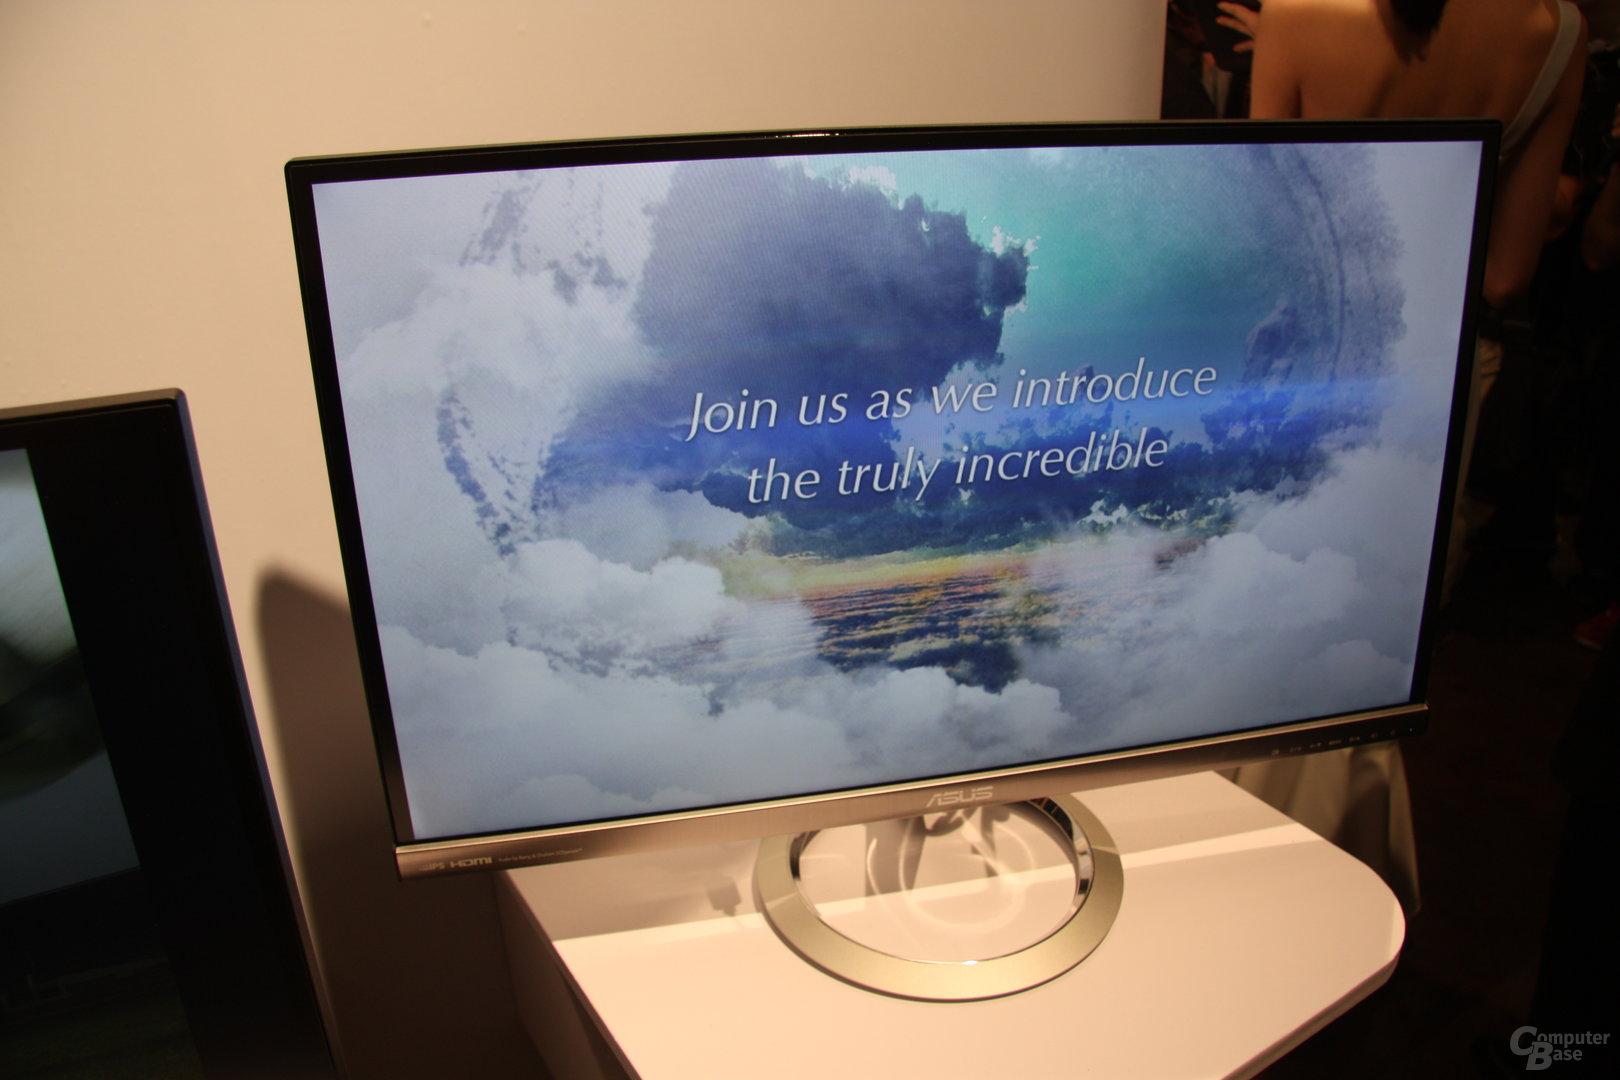 Asus MX-Monitore